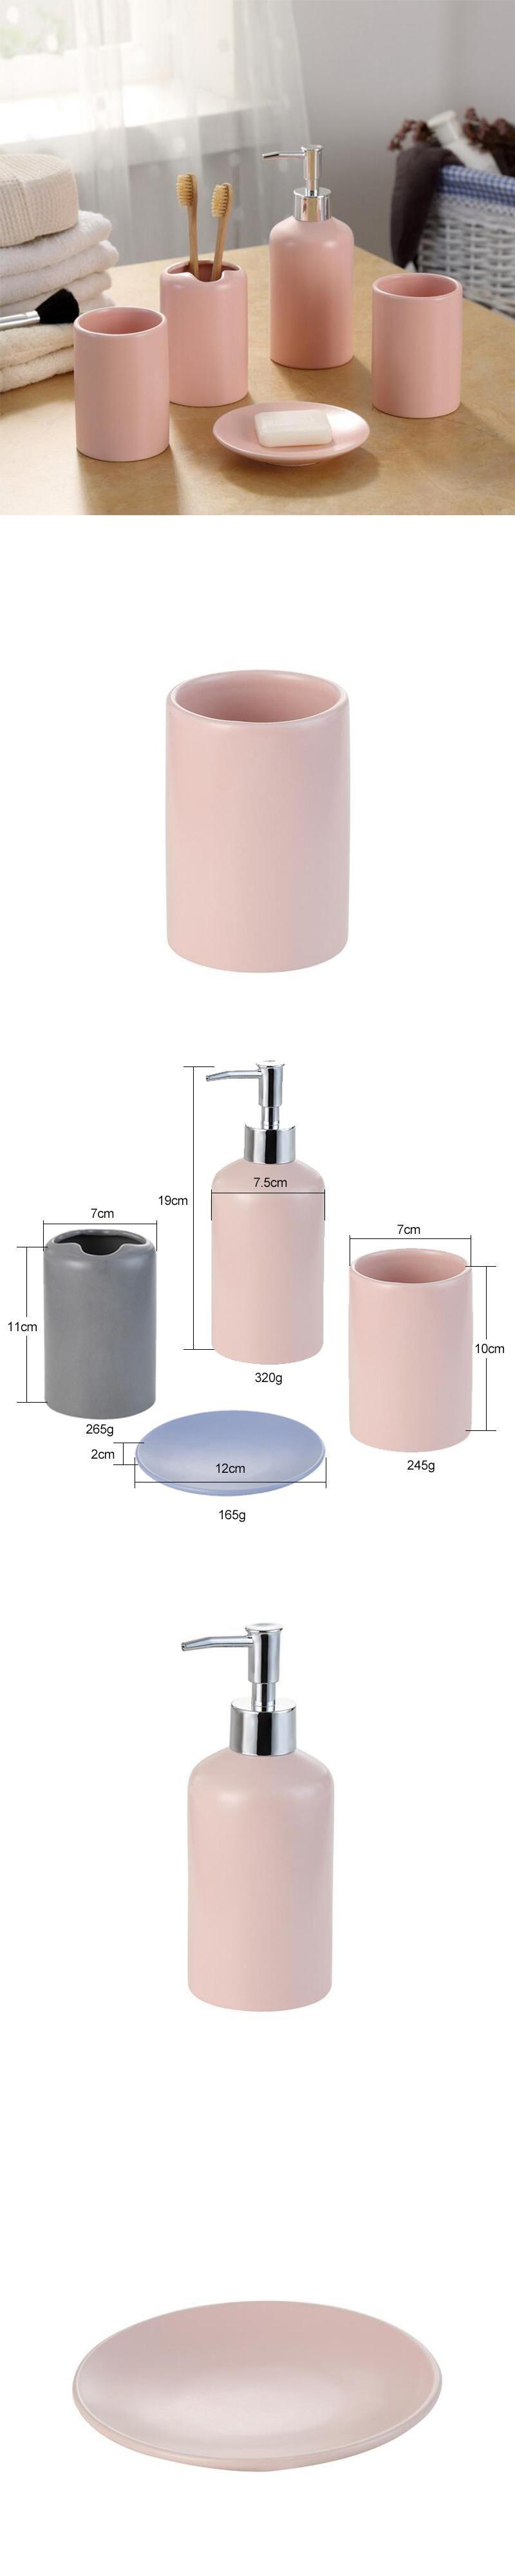 Europe 5pcs Pink Ceramic Toothbrush Holder Cup Soap Dish Shampoo ...